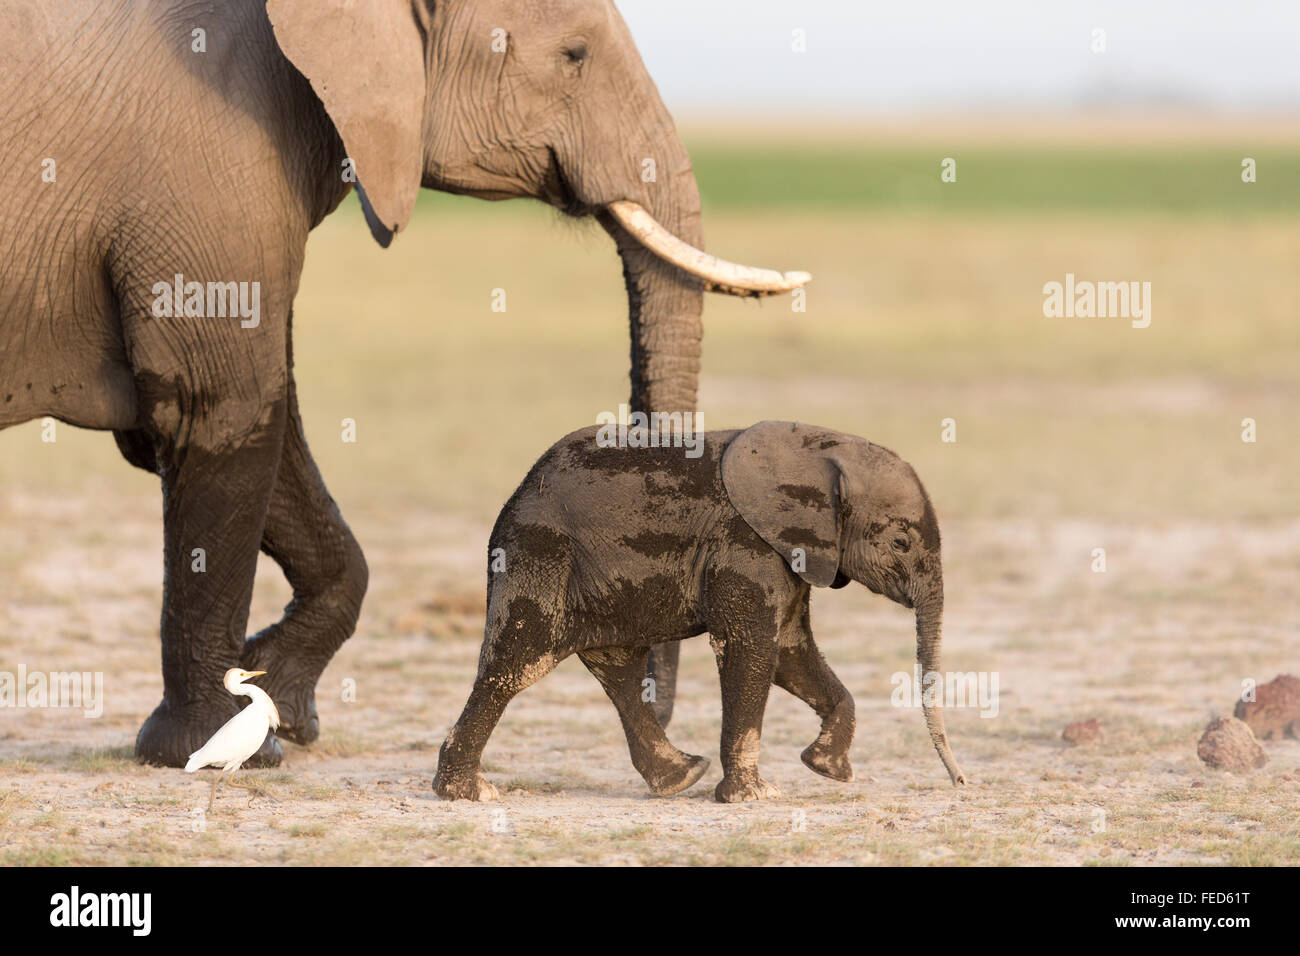 Elefante africano Amboseli National Park in Kenya Immagini Stock